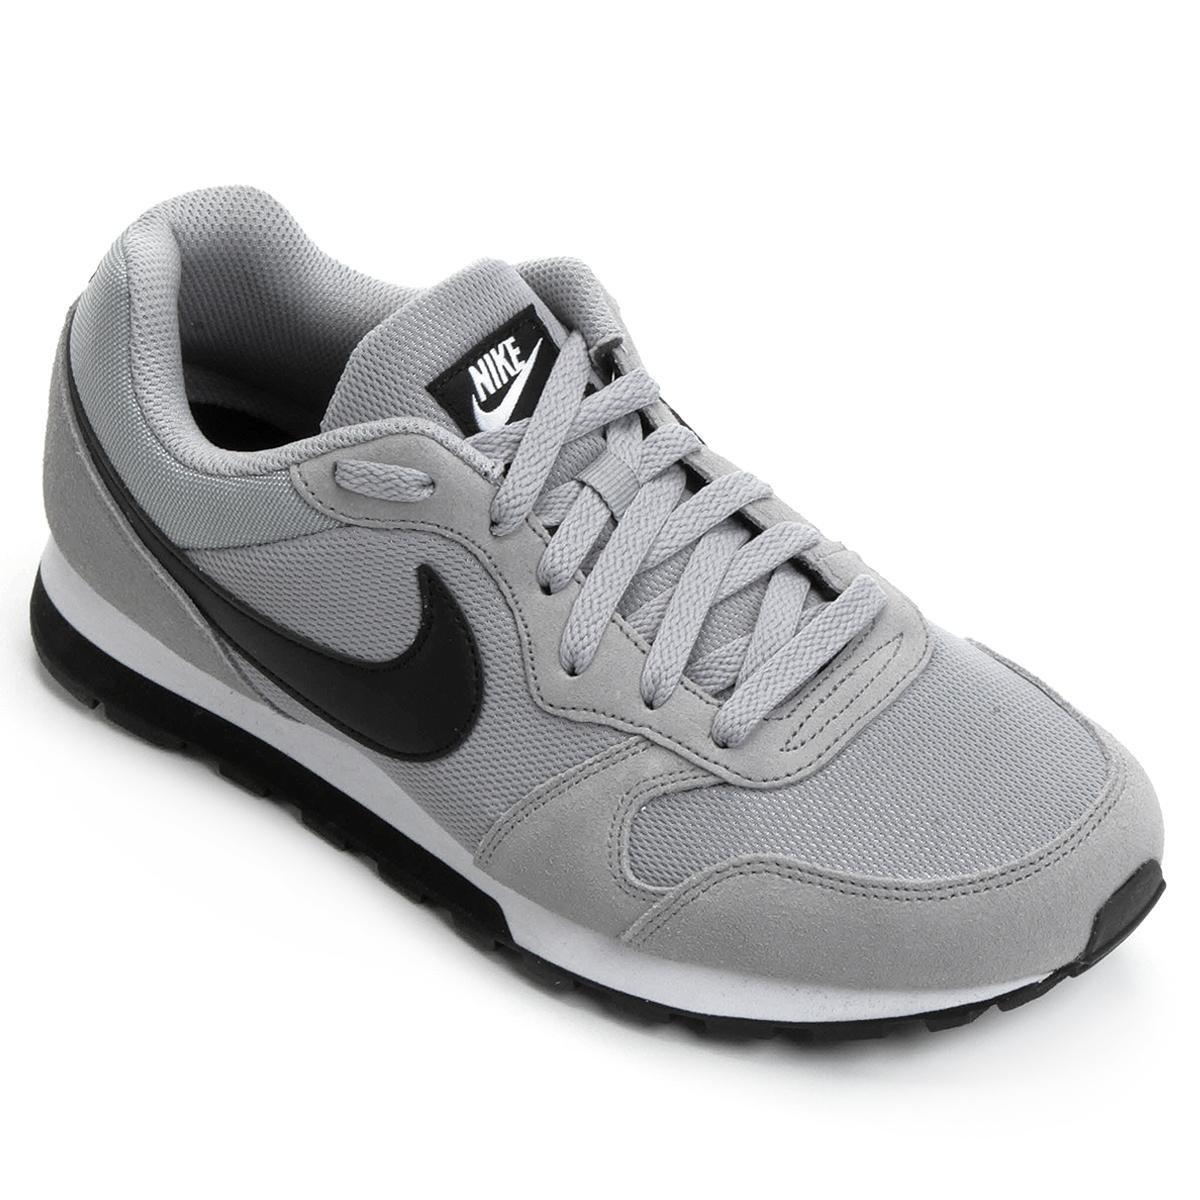 71cb452067a Tênis Nike Md Runner 2 Masculino - Cinza e Preto - Compre Agora ...